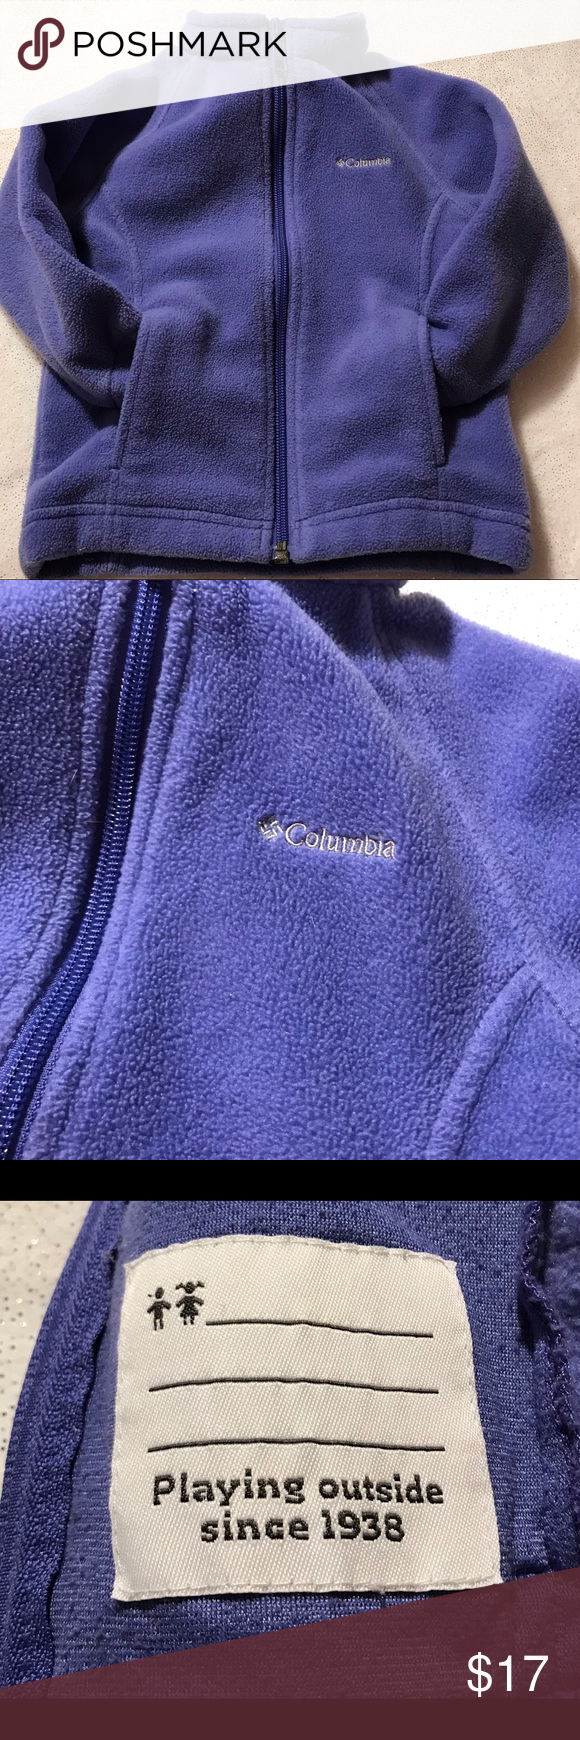 ccdbfda709c8 Columbia Fleece zip up jacket sz 18-24months  Columbia Fleece Jacket ...